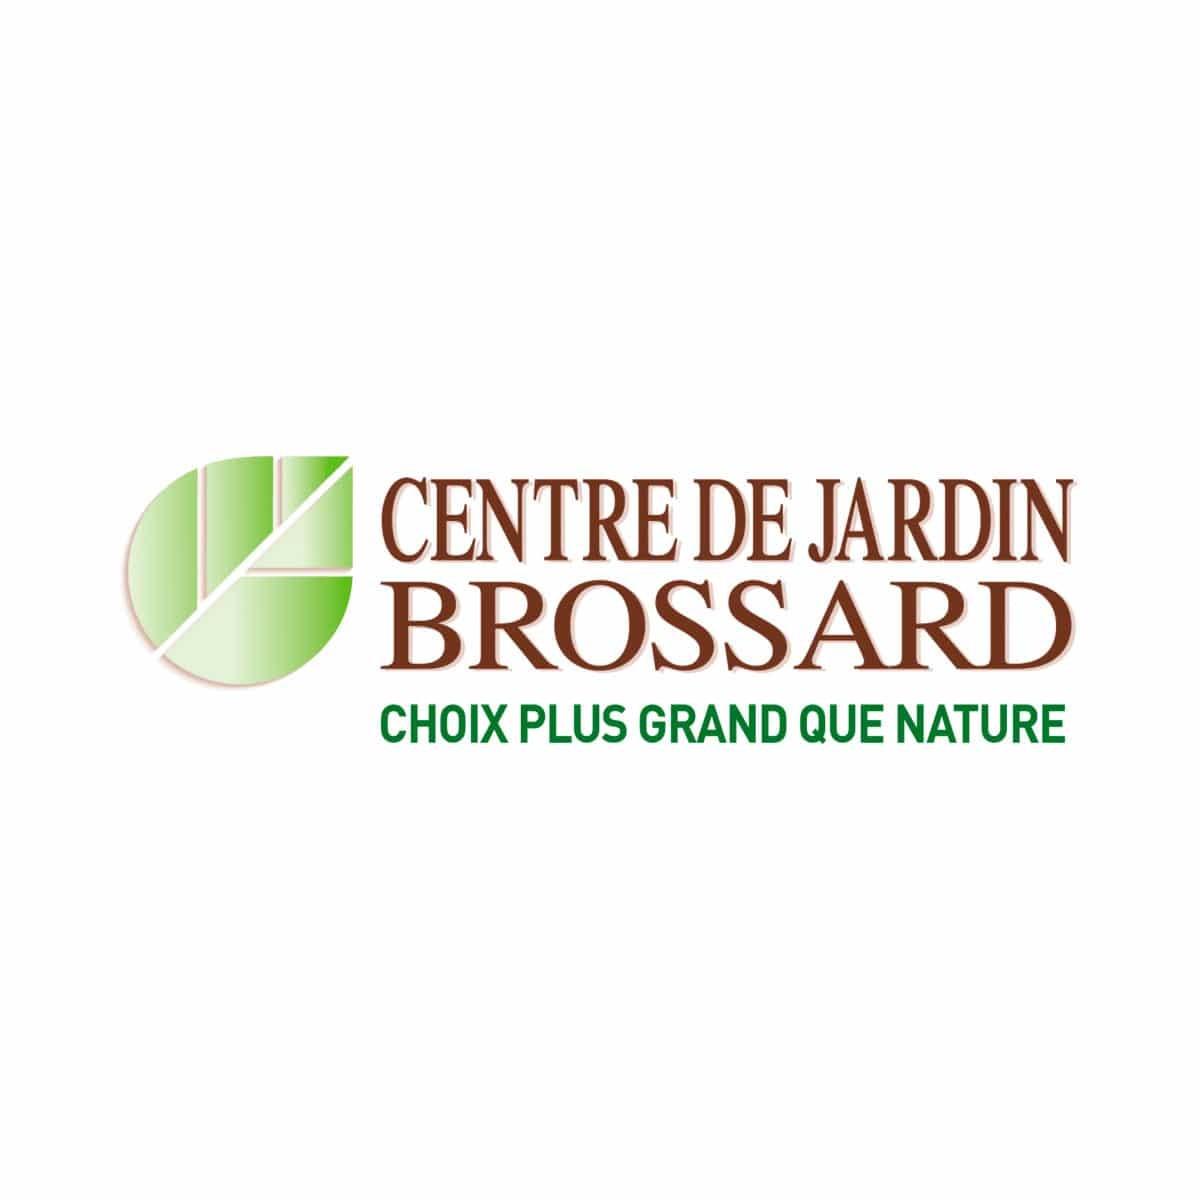 View Centre de Jardin Brossard Flyer online